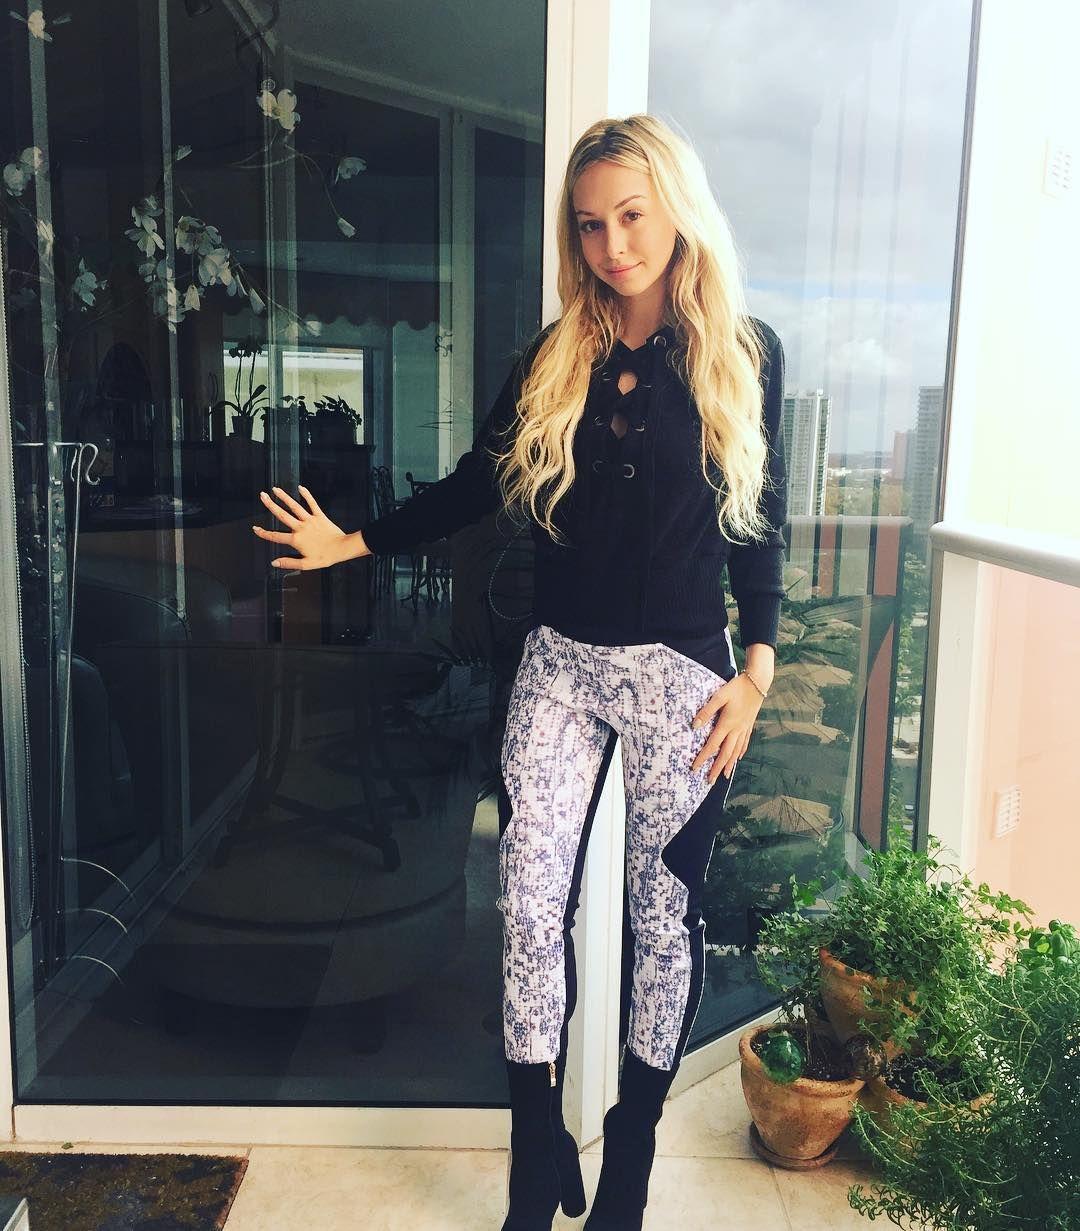 Corinne Olympios is so fascinating, insists \u0027The Bachelor\u0027 host ...